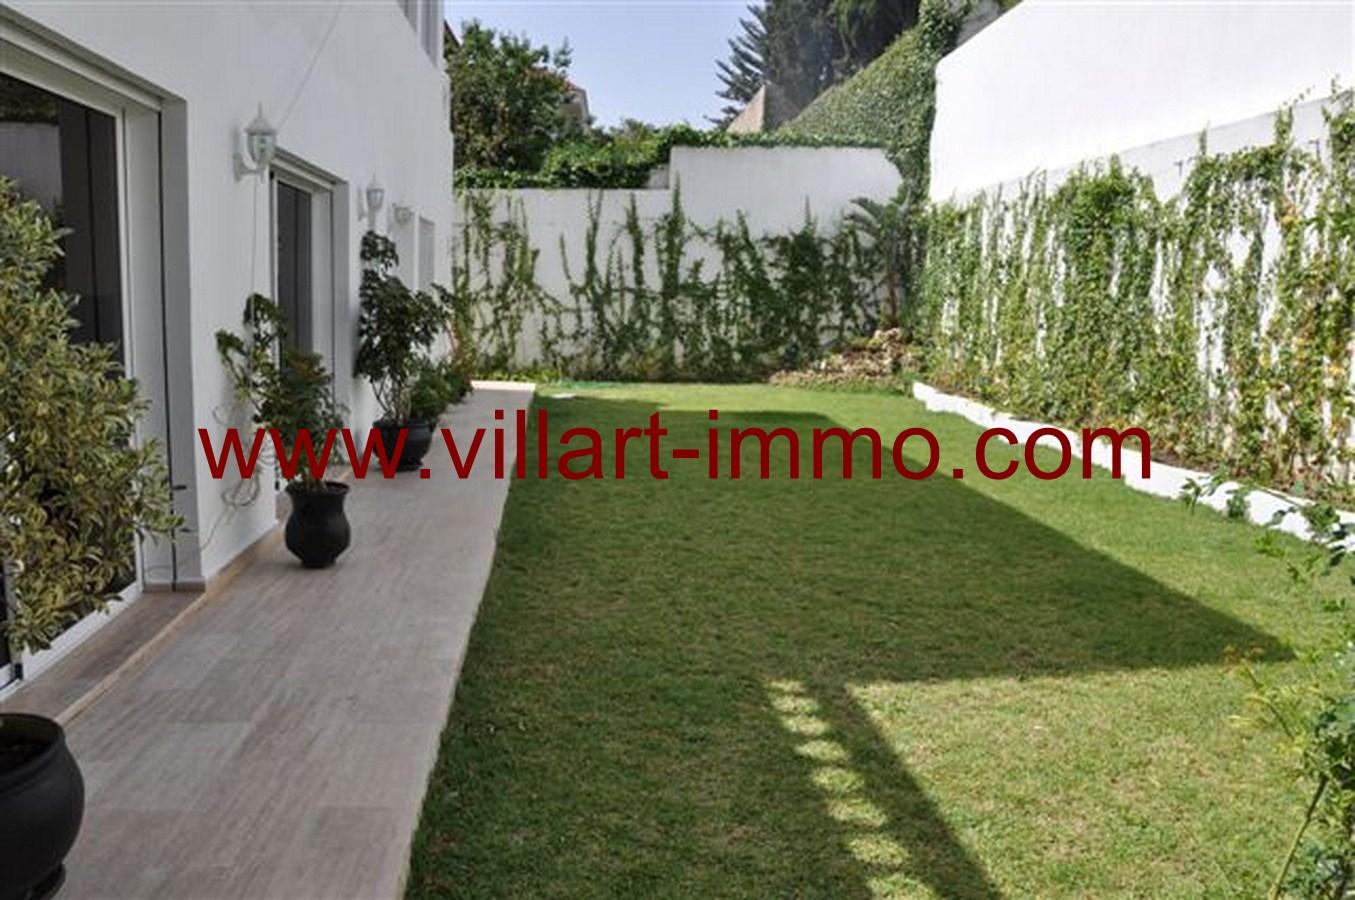 2-Location-Maison-Meublée-Tanger-Bella-Vista-Jardin-LV232